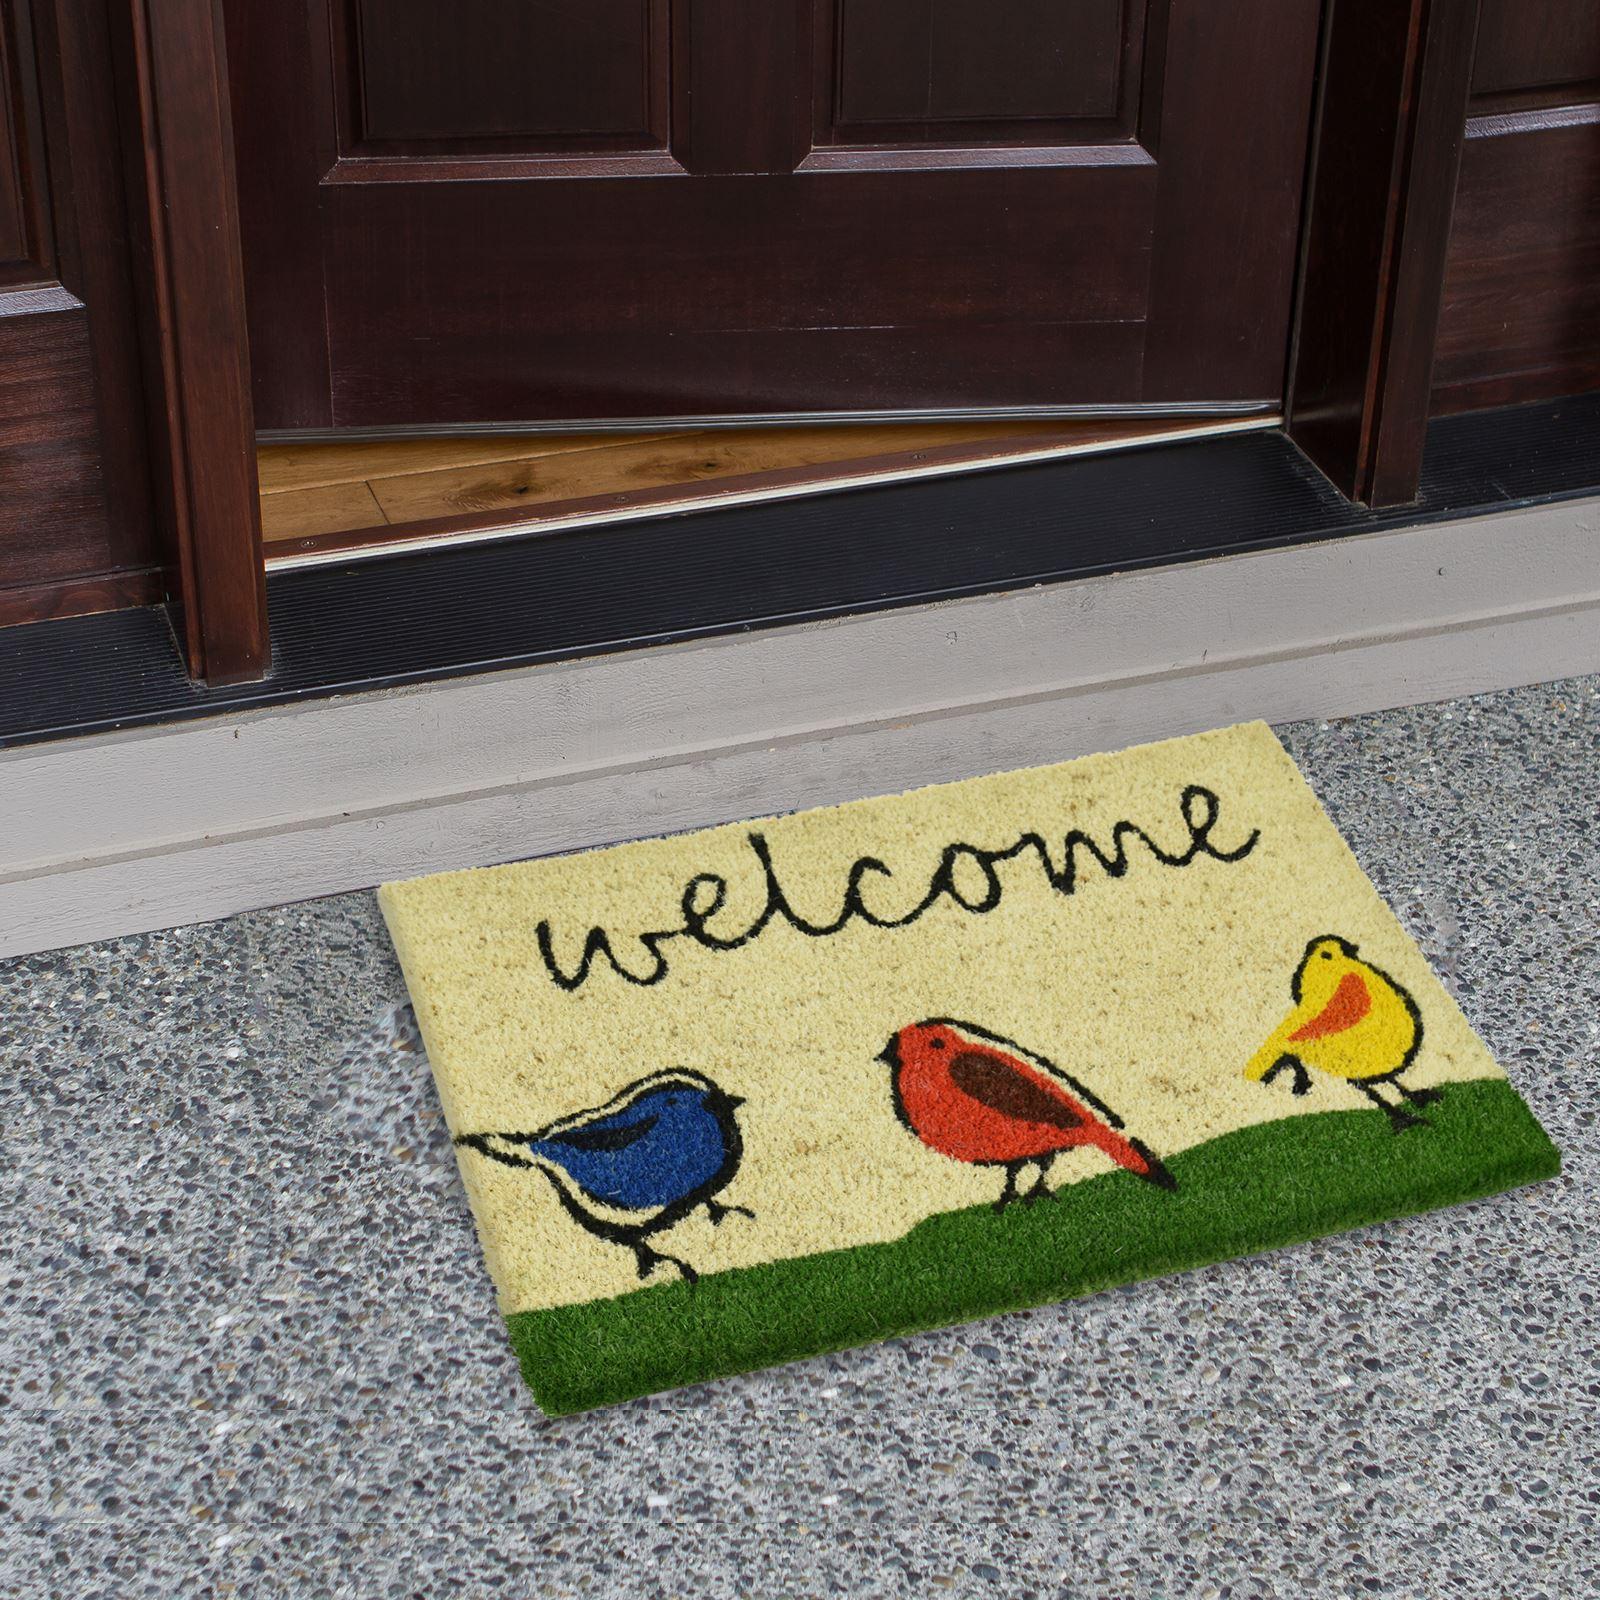 Plain-Non-Slip-Door-Mat-Tough-Natural-Coir-PVC-Back-Welcome-Doormat-40-x-60cm miniatura 9